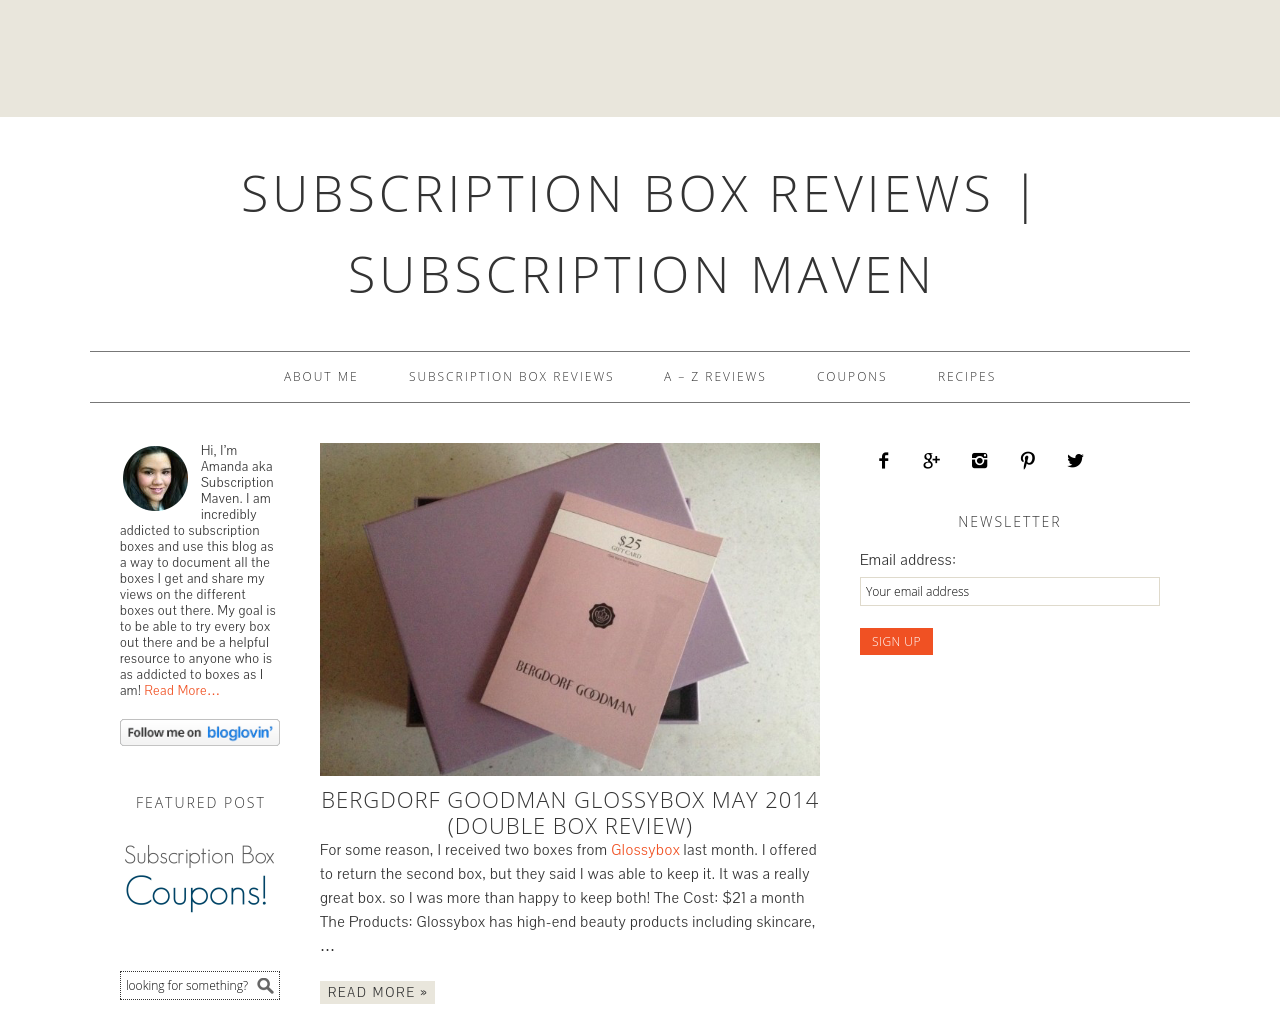 Subscription-Box-Reviews-Advertising-Reviews-Pricing